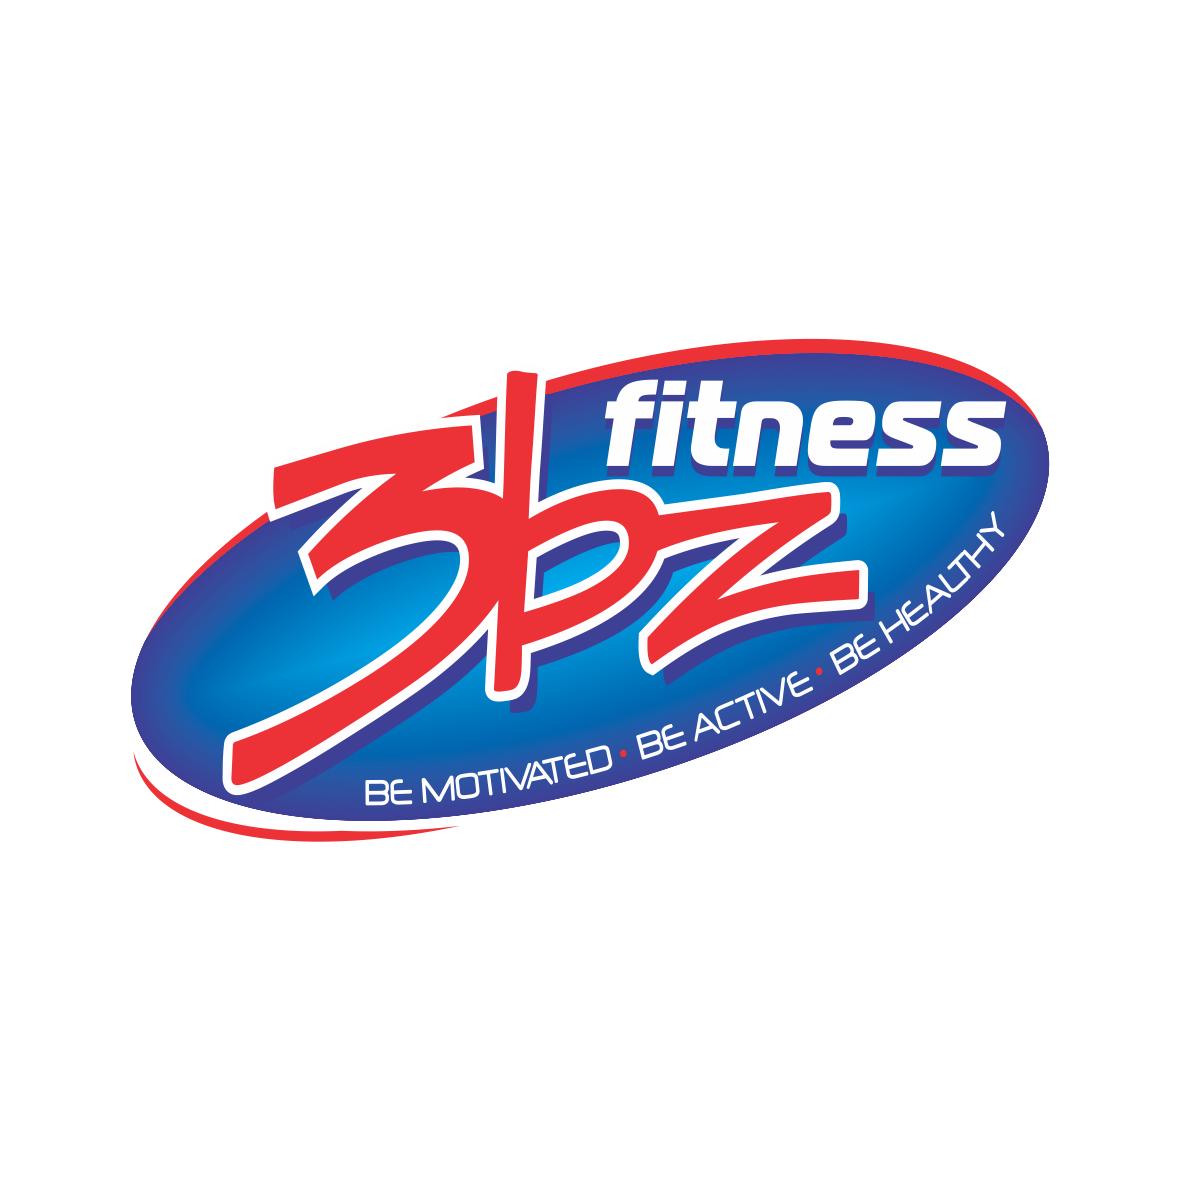 3bz fitness - lushgraphix